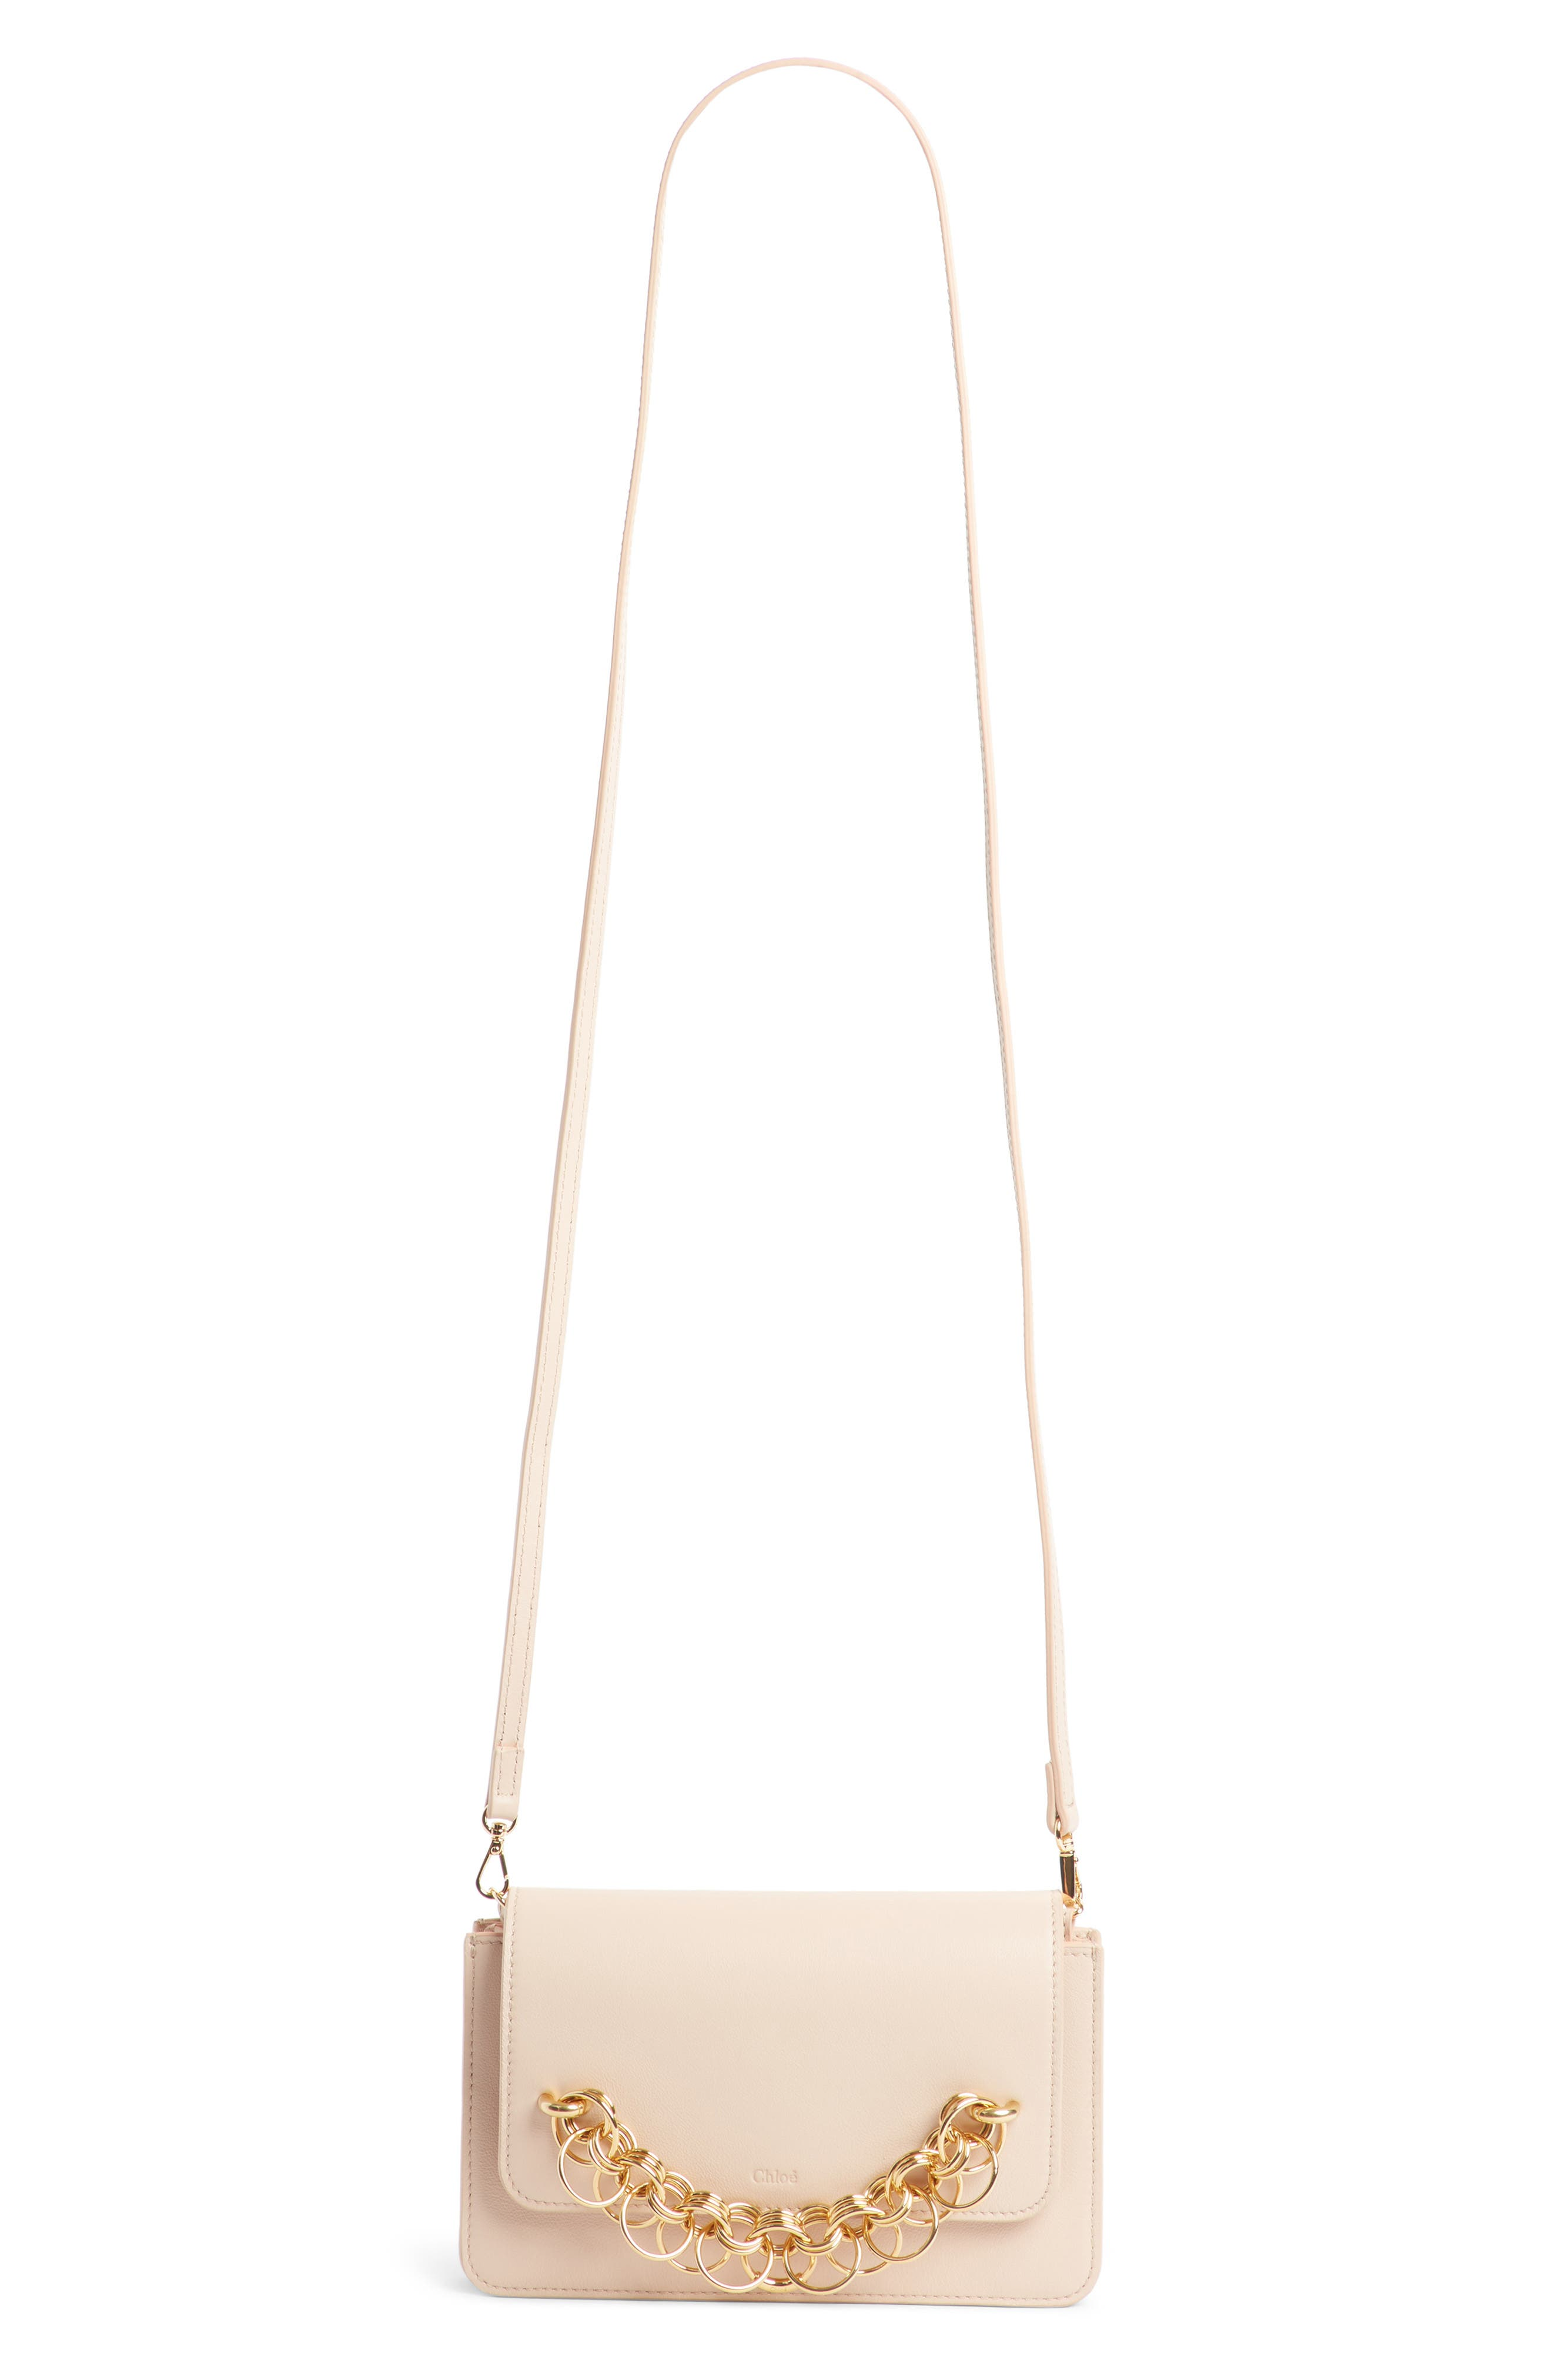 Drew Bijoux Leather Crossbody Bag,                             Main thumbnail 1, color,                             CEMENT PINK